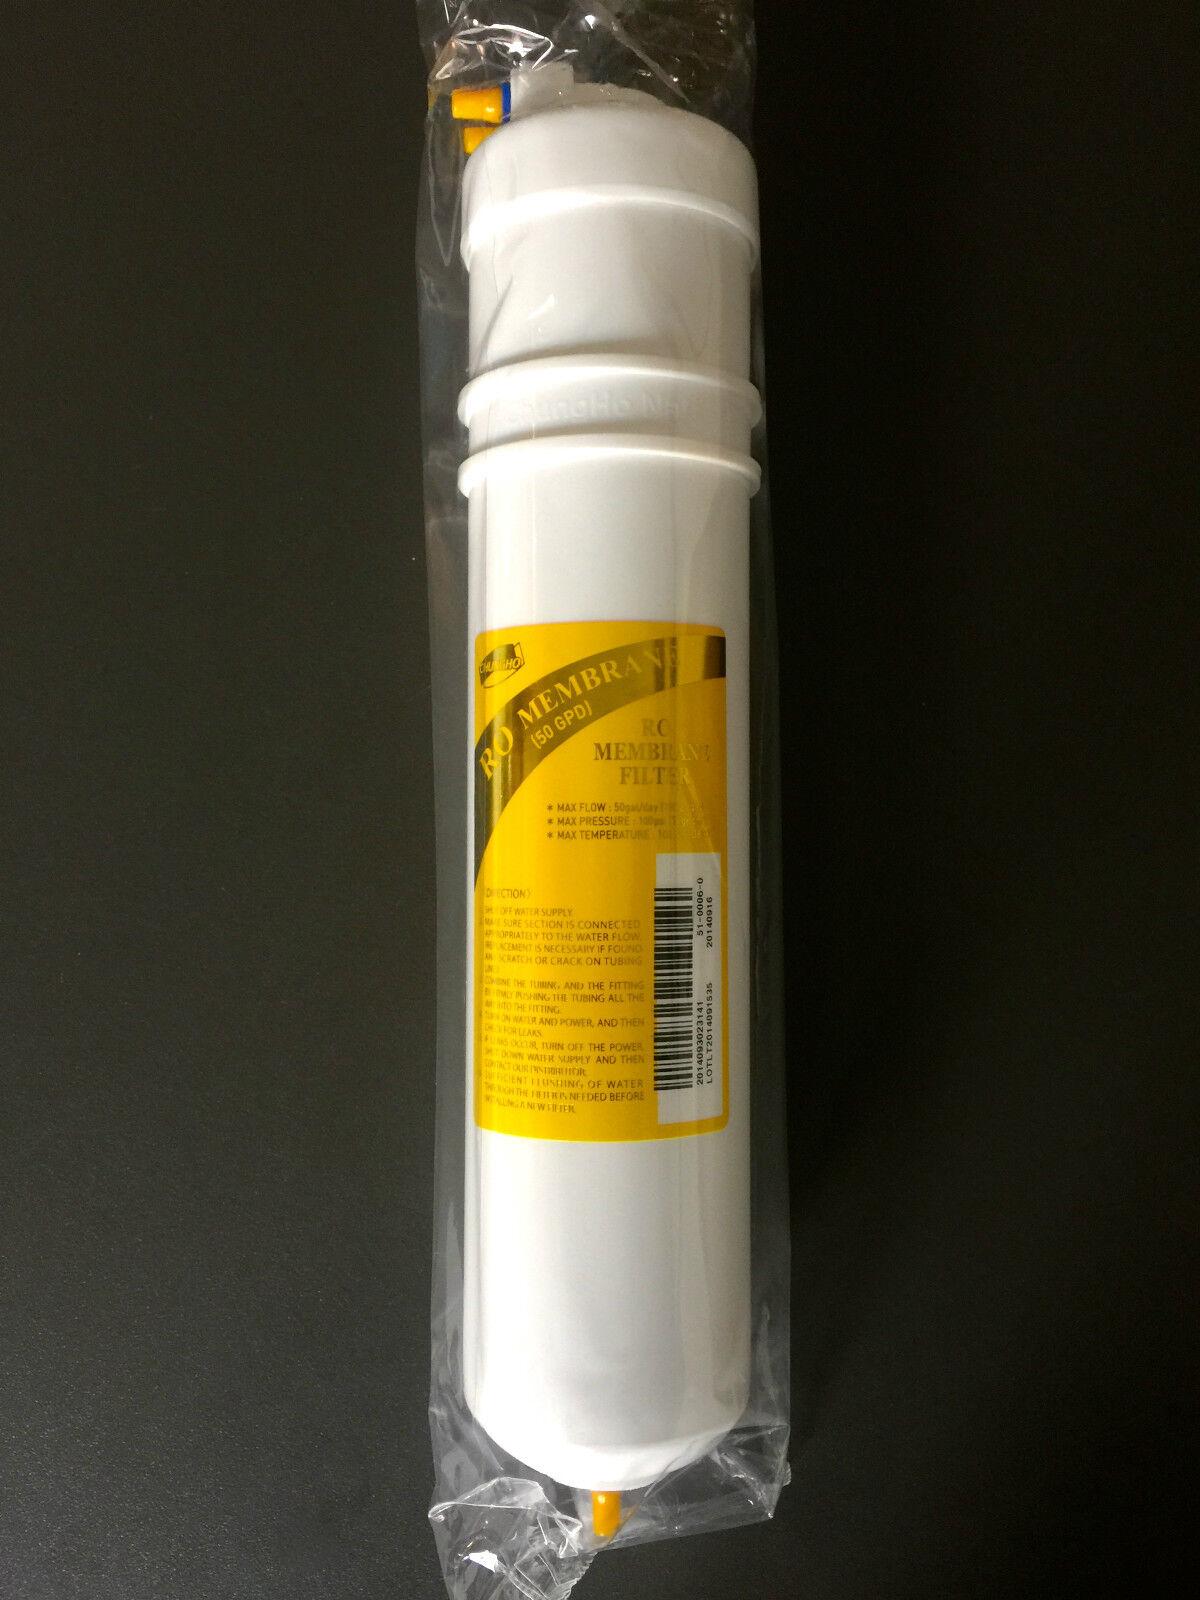 RO Membrane pour Apas Vital Osmose inverse Usine, insTailletion, plante